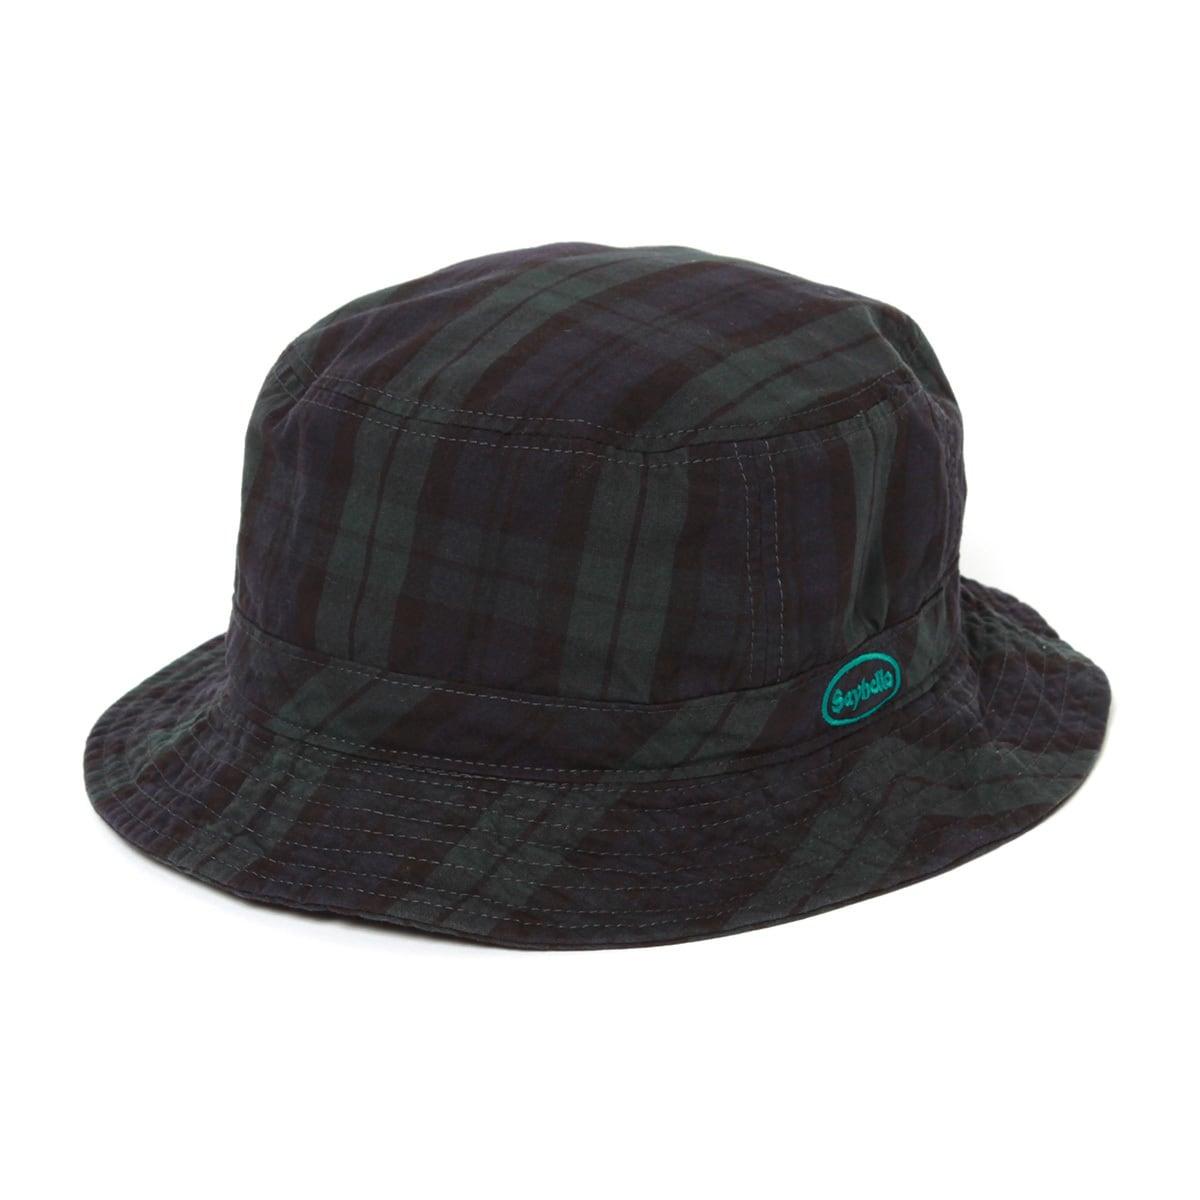 SAYHELLO/Check Washed Hat